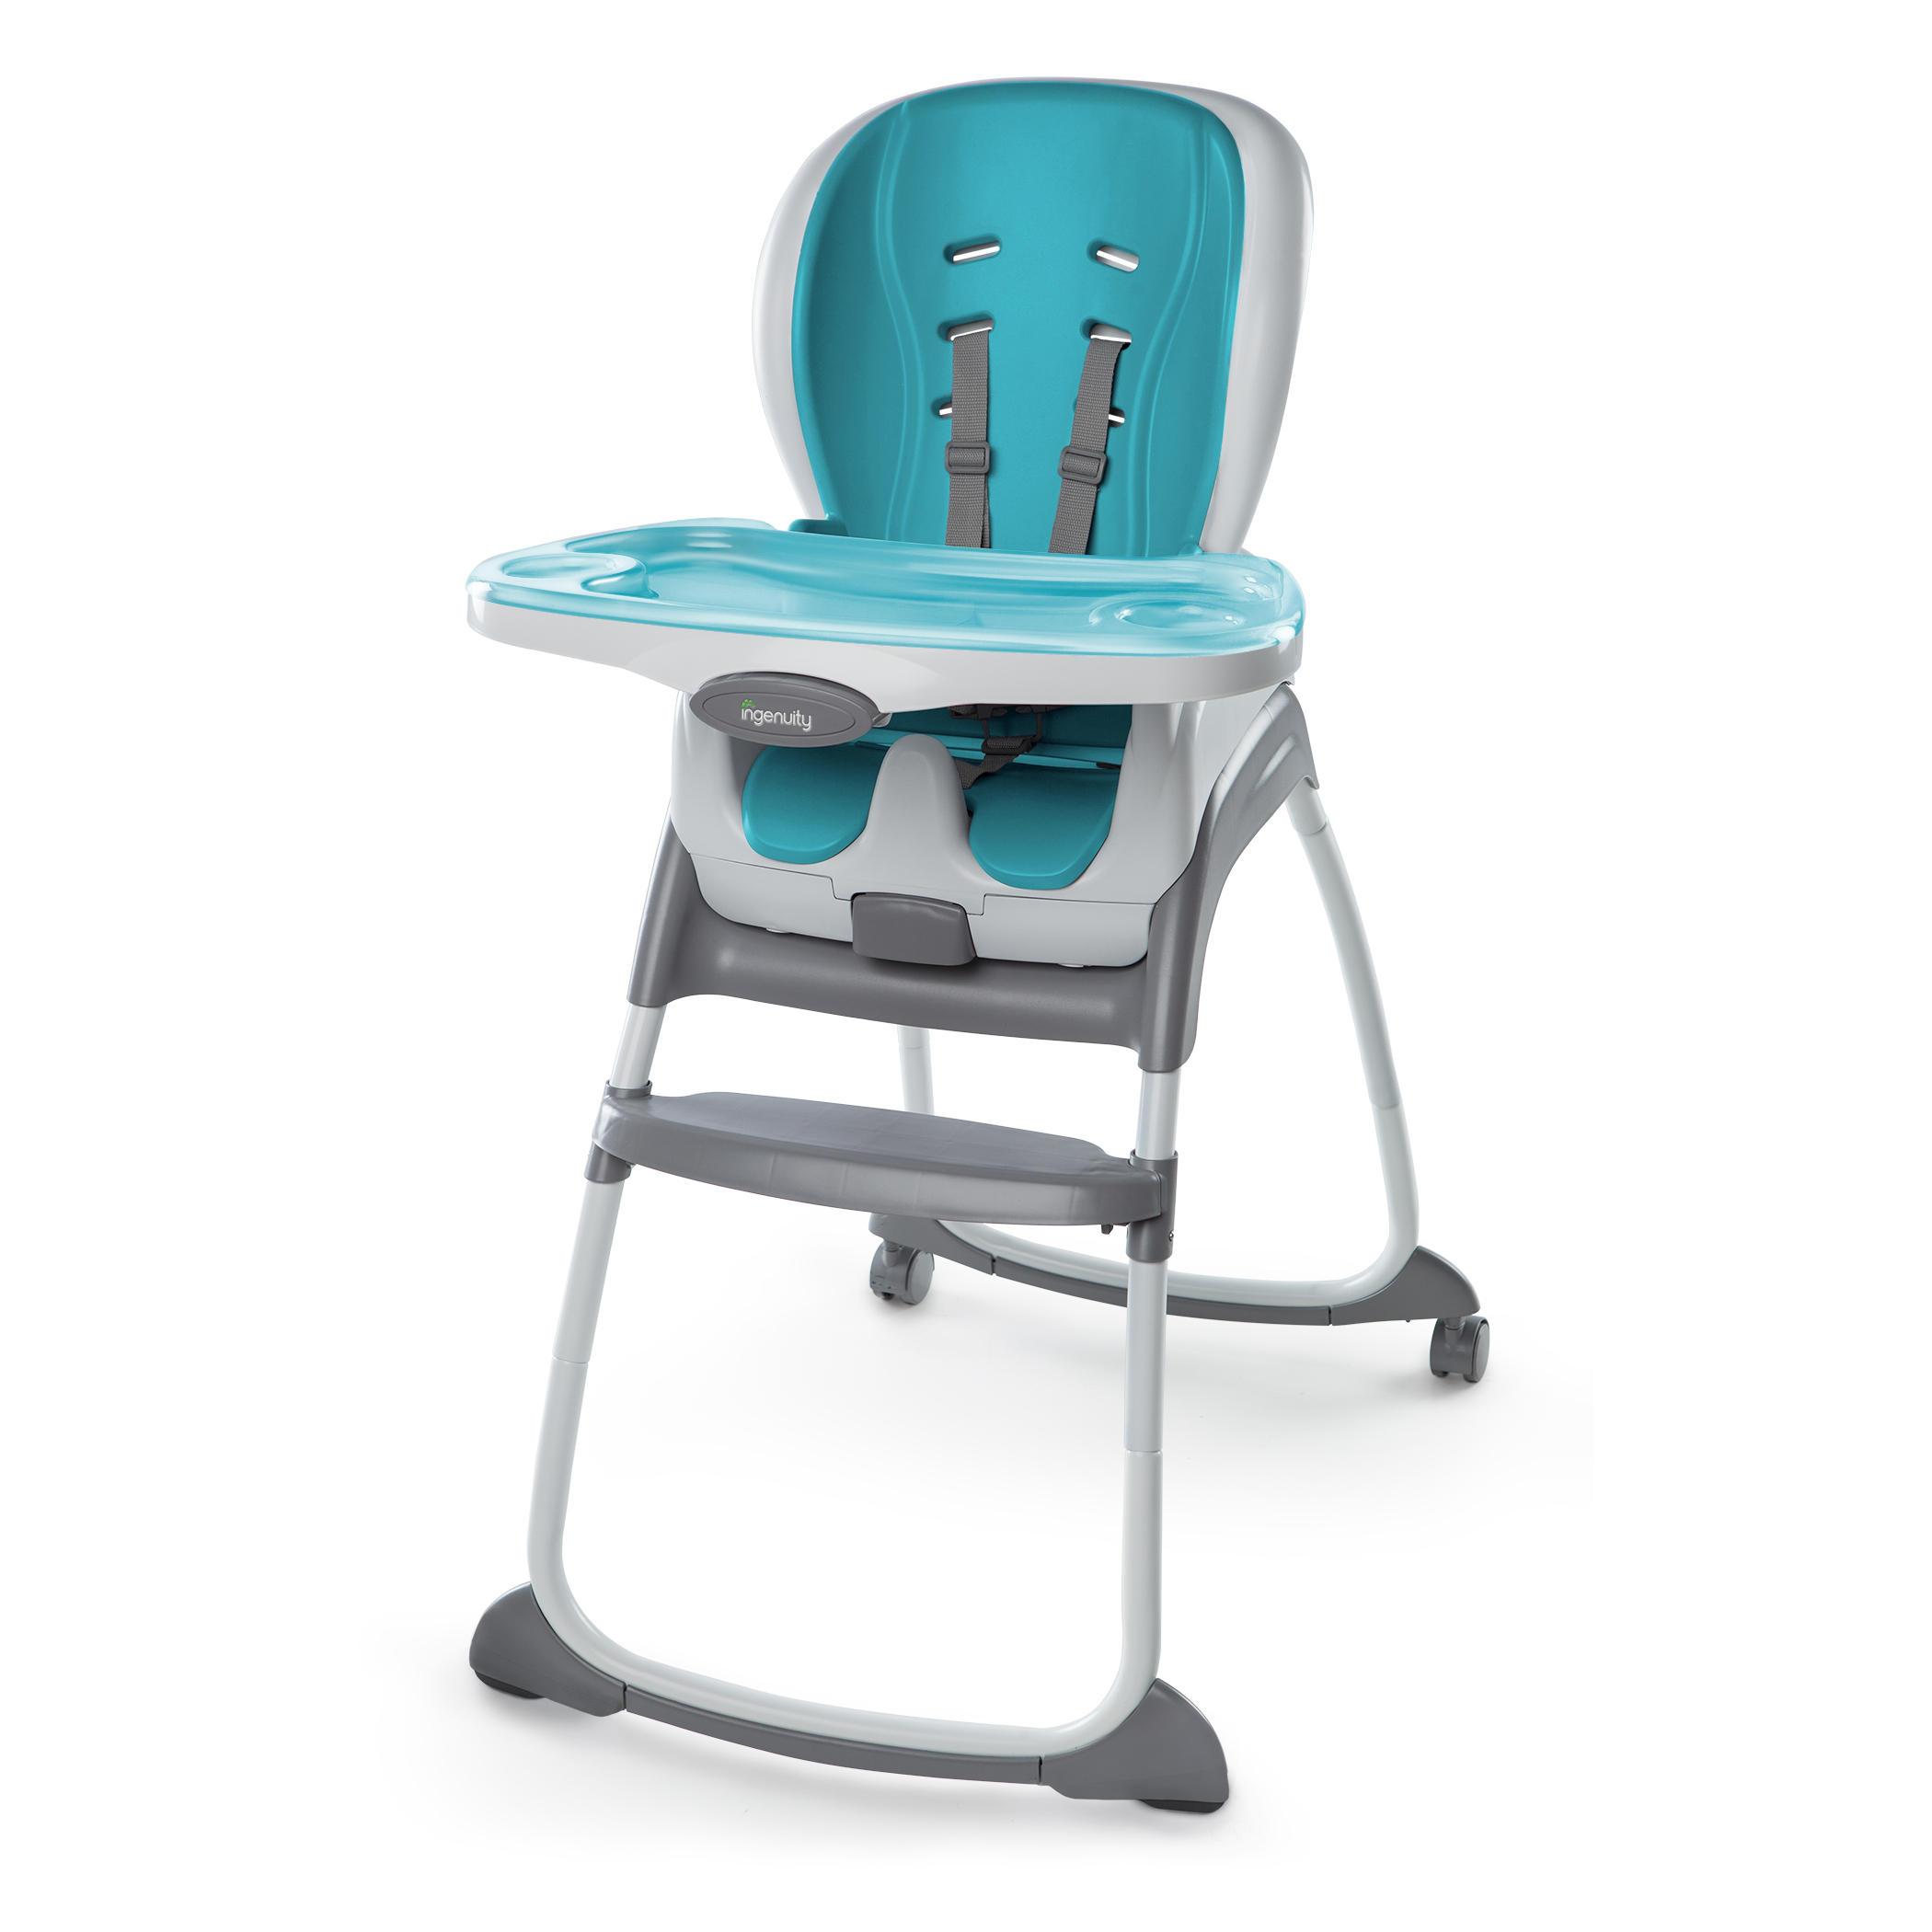 Ingenuity Židle jídelní Trio 3v1 Aqua 6m +, do 22kg, 2016